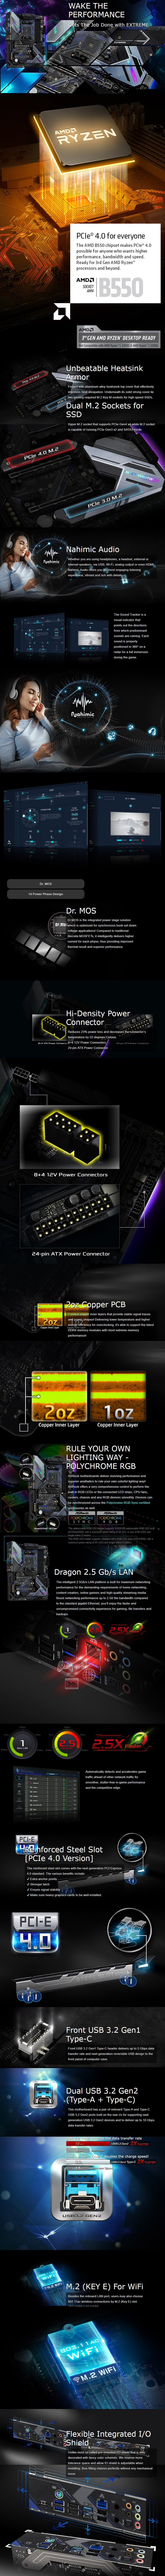 asrock-b550-extreme4-am4-atx-motherboard-ac35646-6.jpg